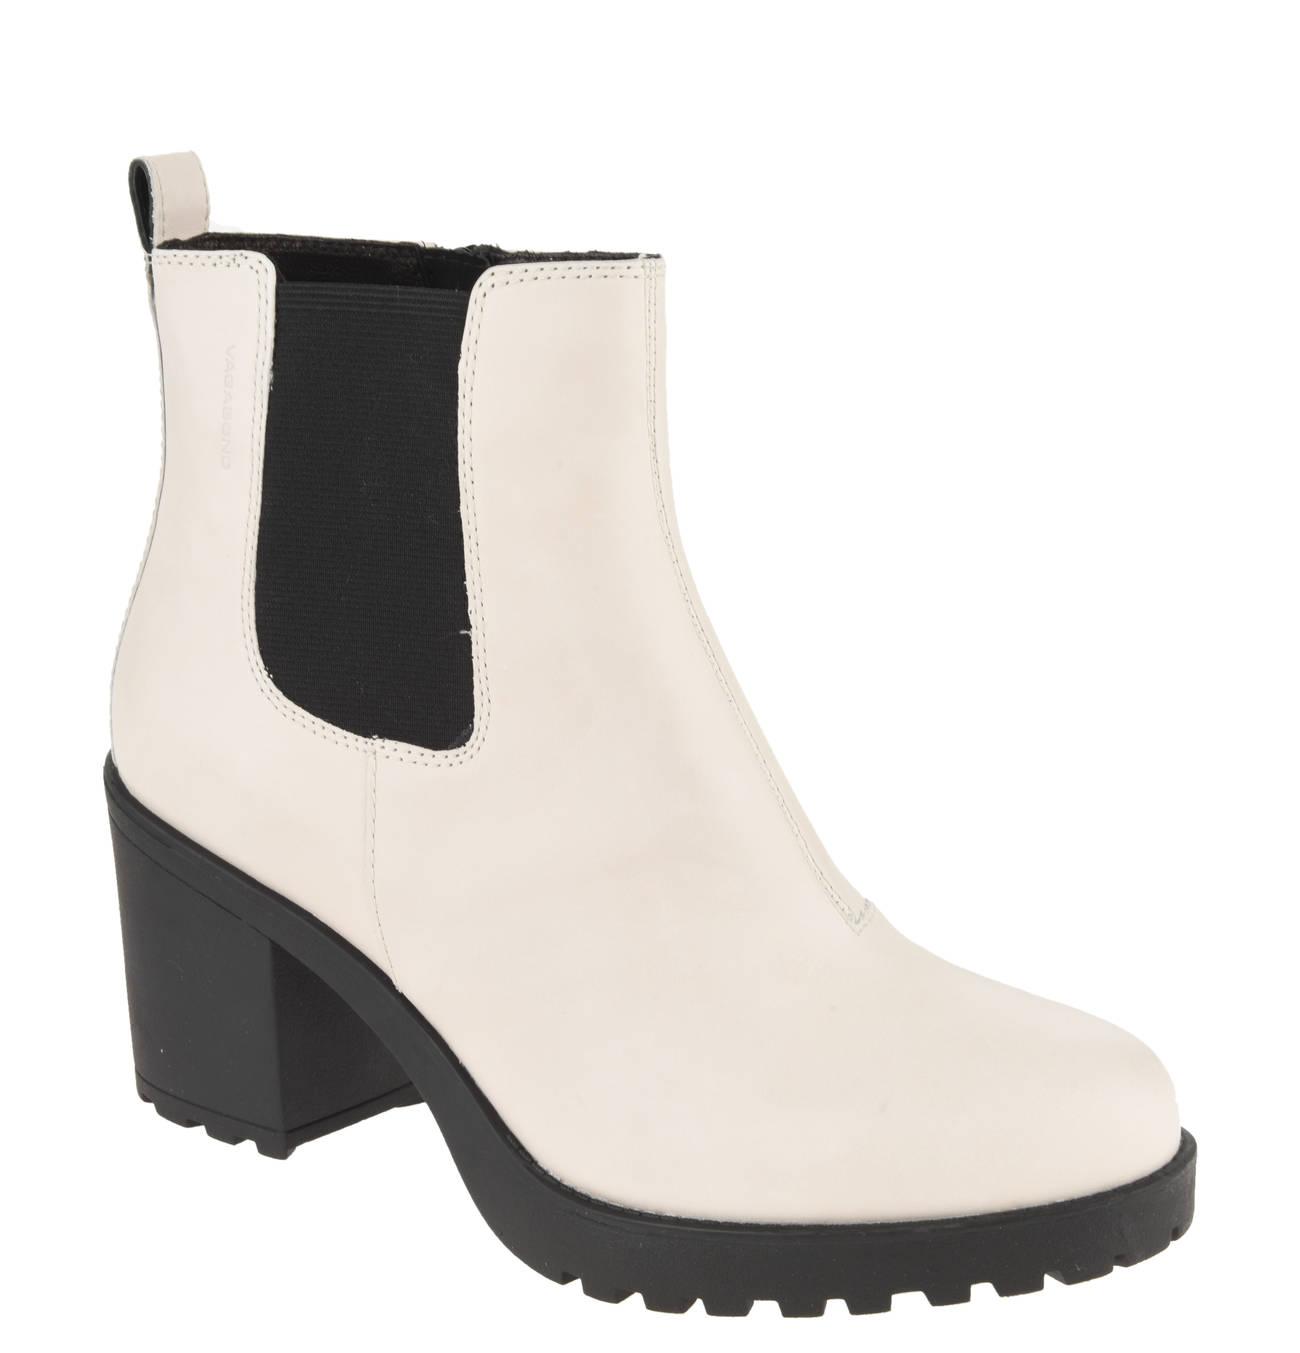 Chelsea Boots, Leder, Blockabsatz, Marken Prägung | Products